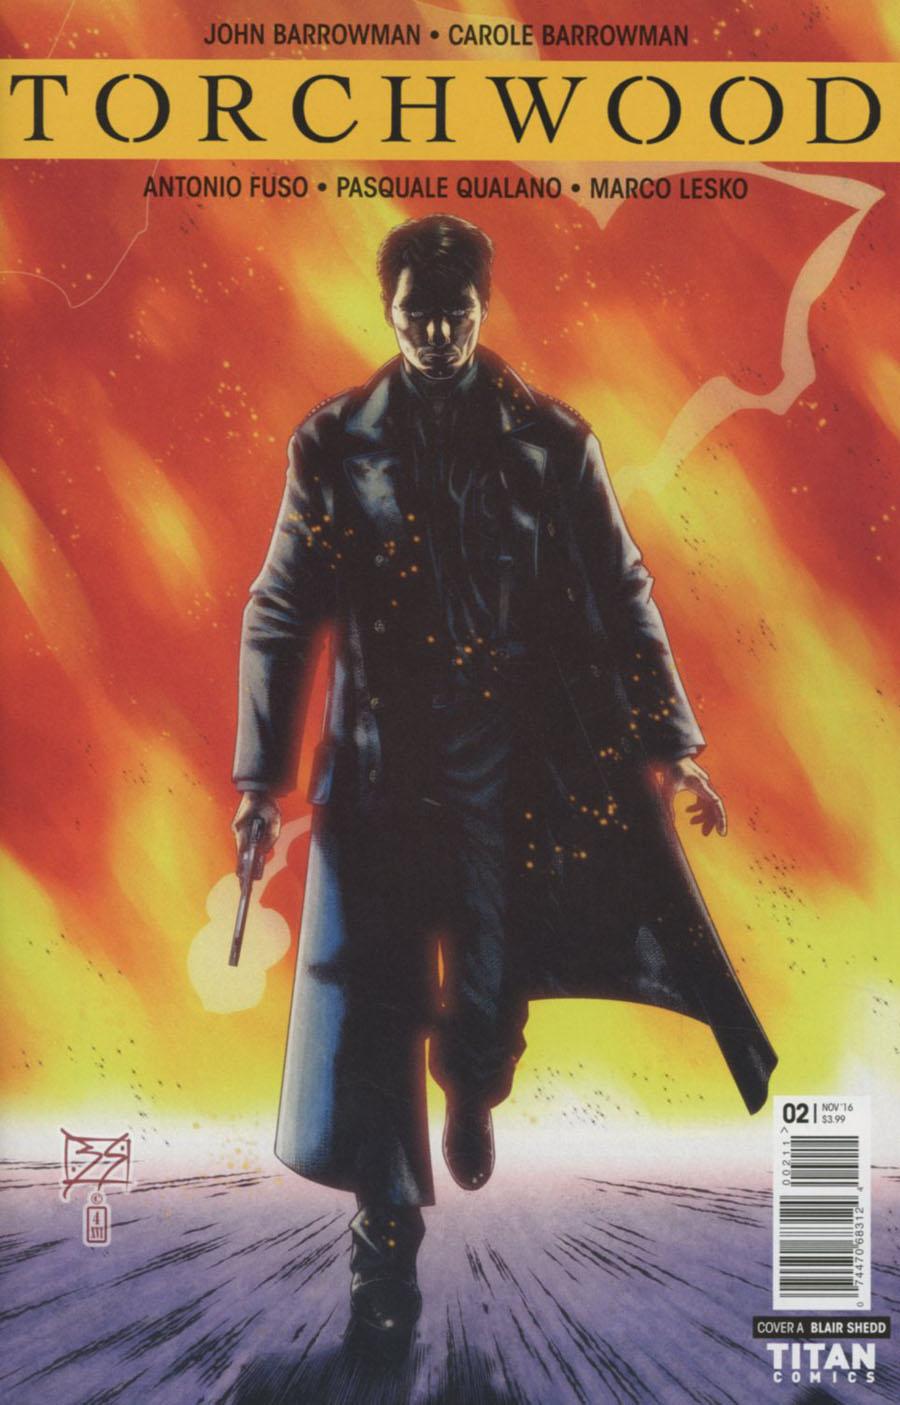 Torchwood Vol 2 #2 Cover A Regular Blair Shedd Cover